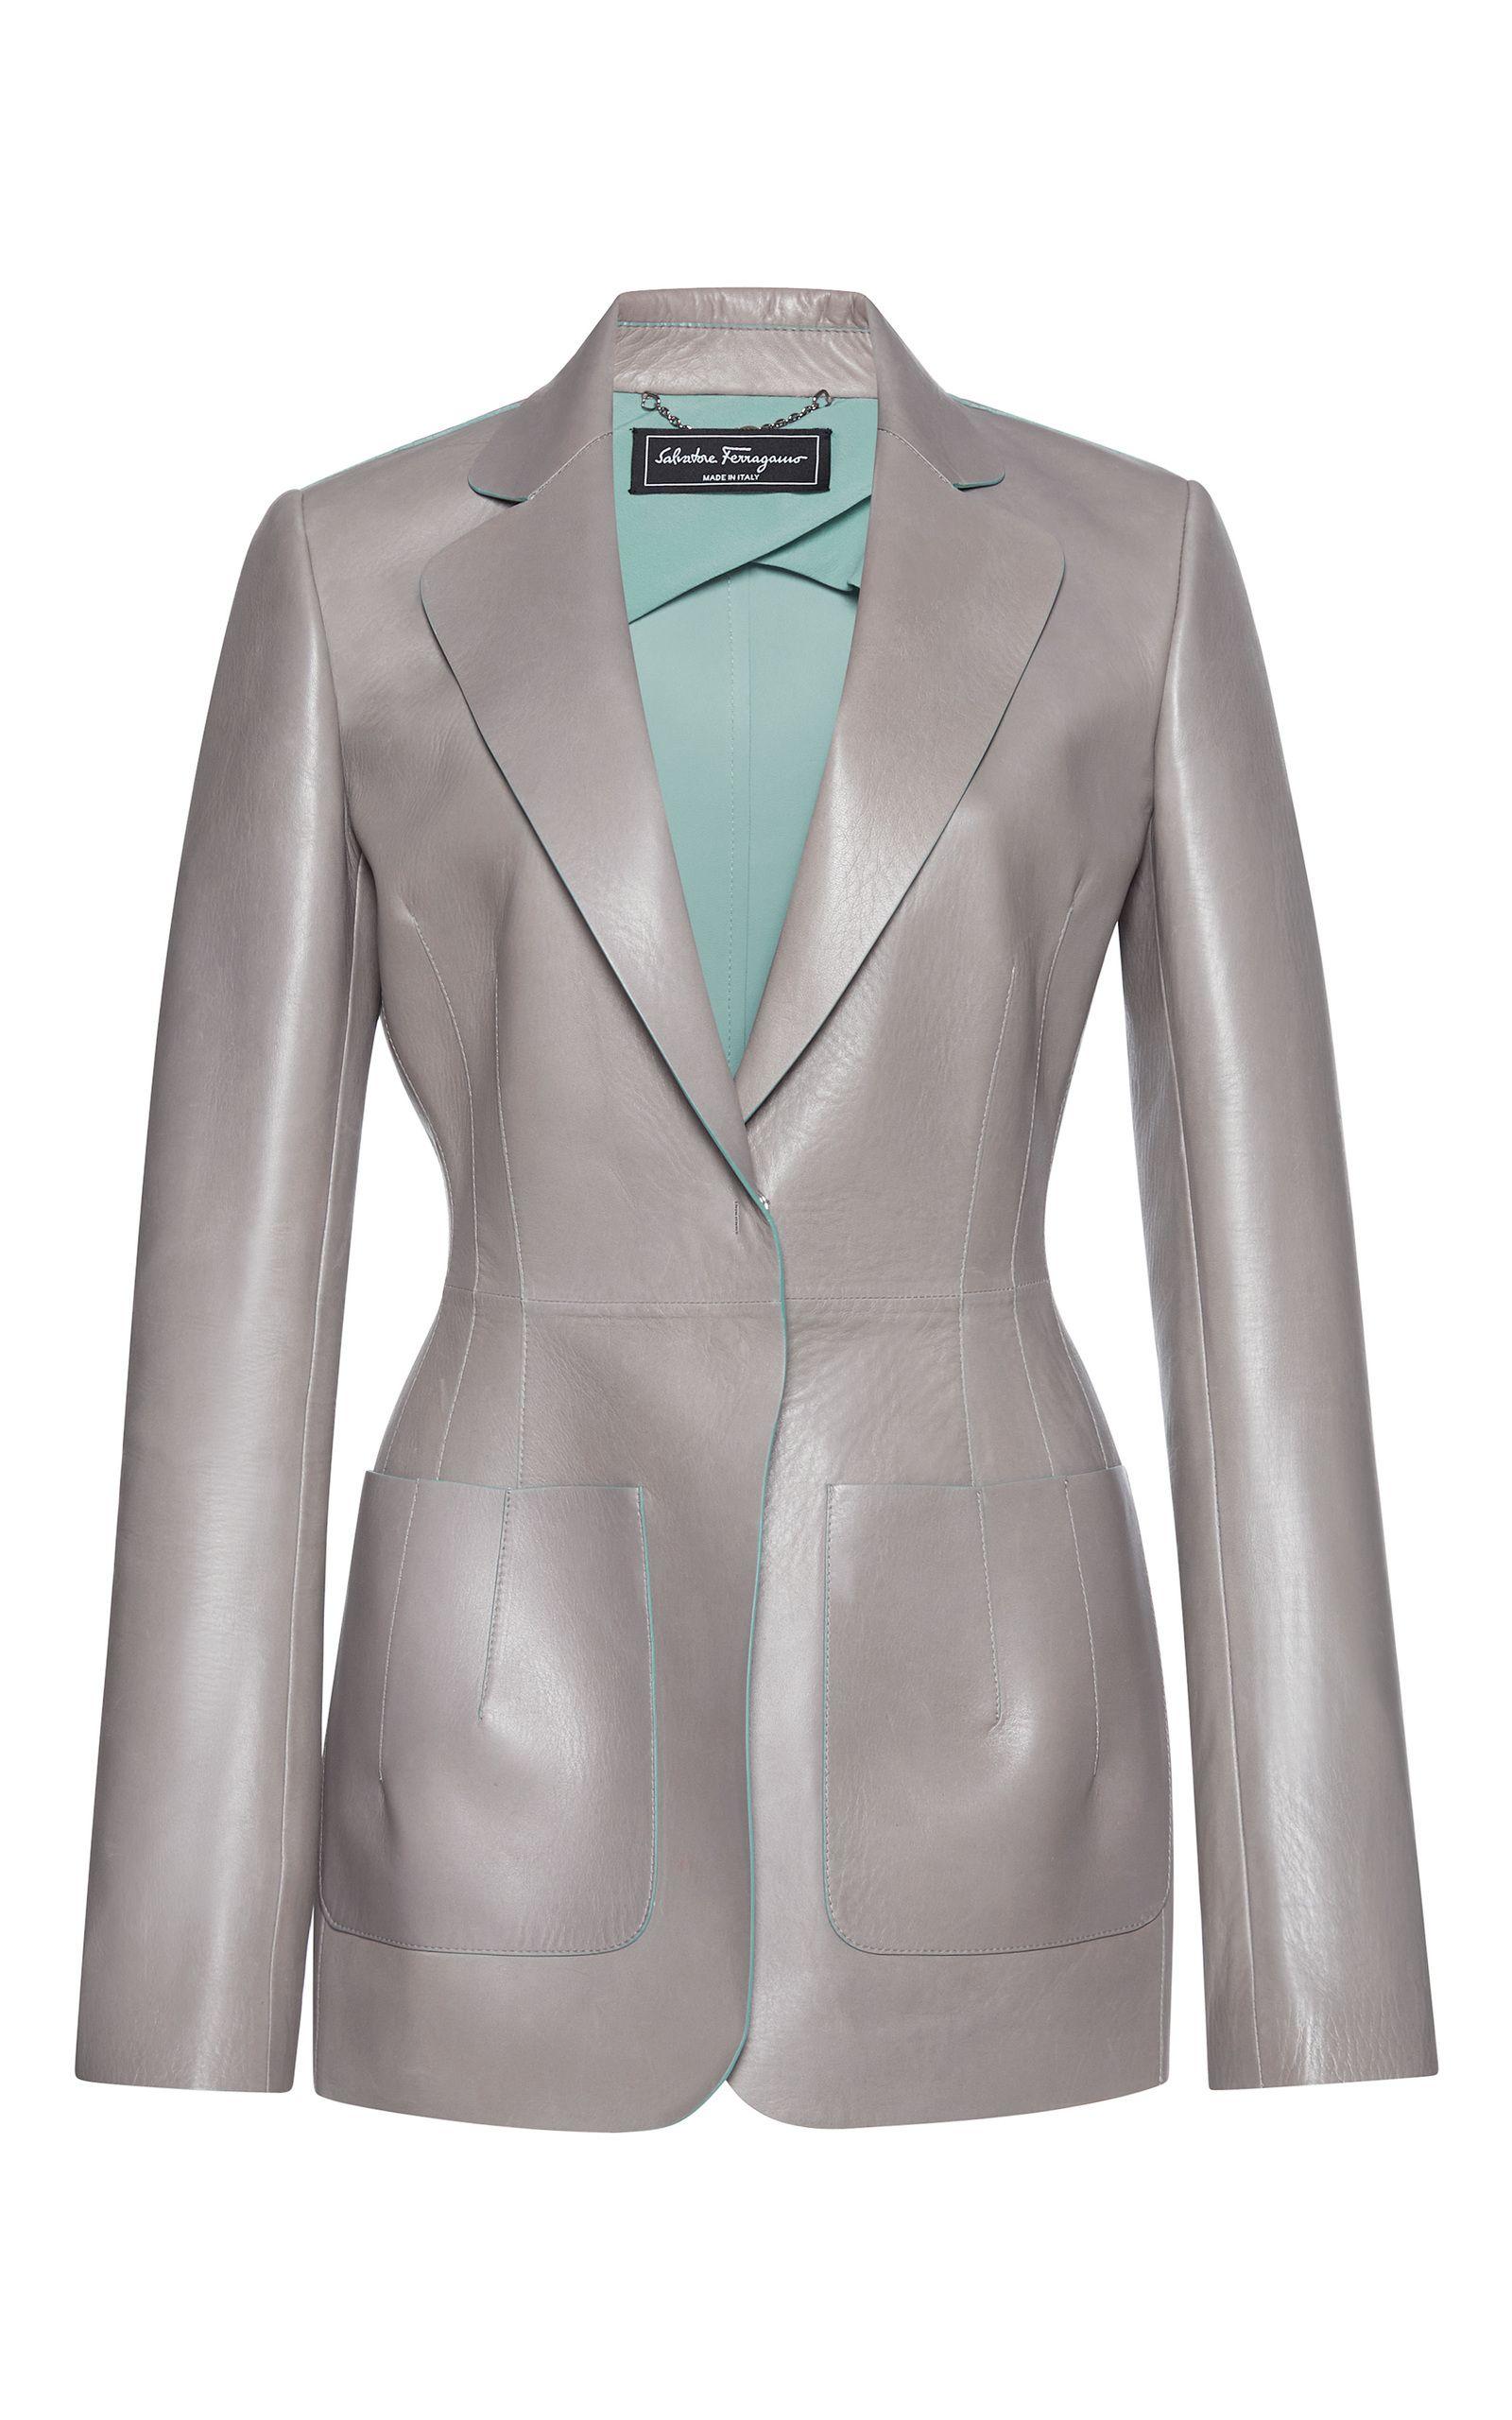 Feragamo Leather Blazer  €2.748, napa leather,